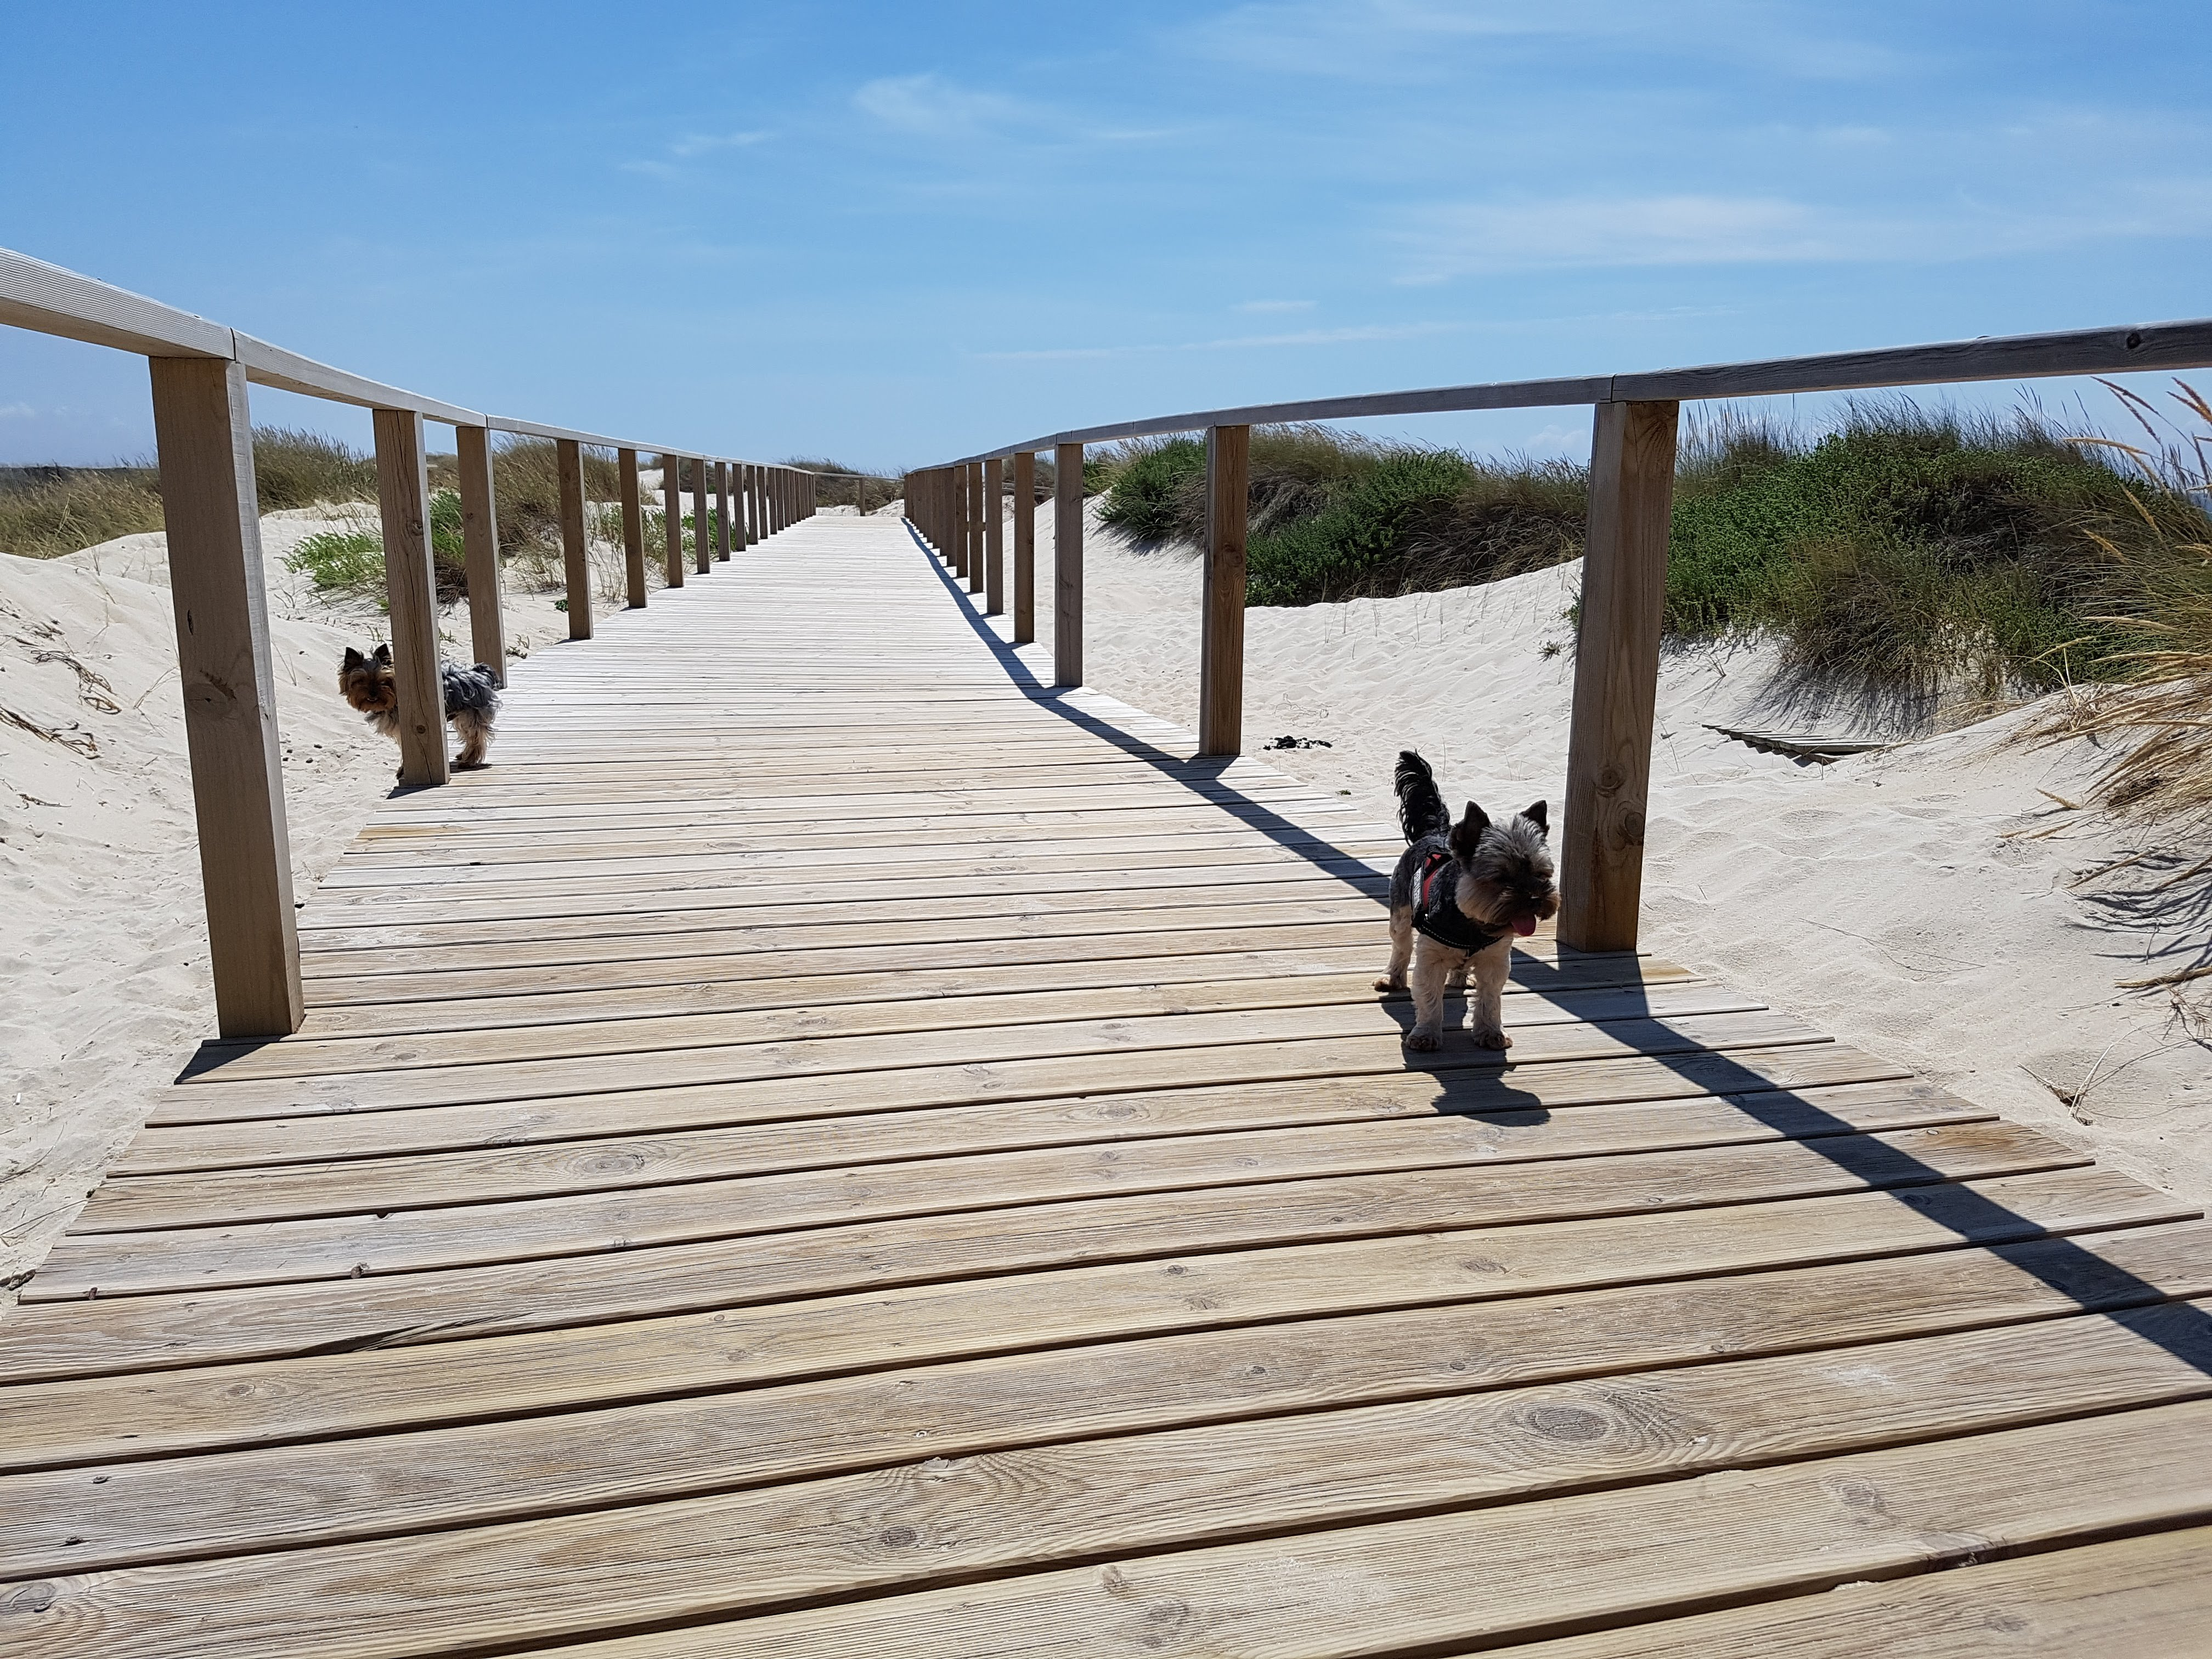 Playa Costa Nova Aveiro Pekesviajeros